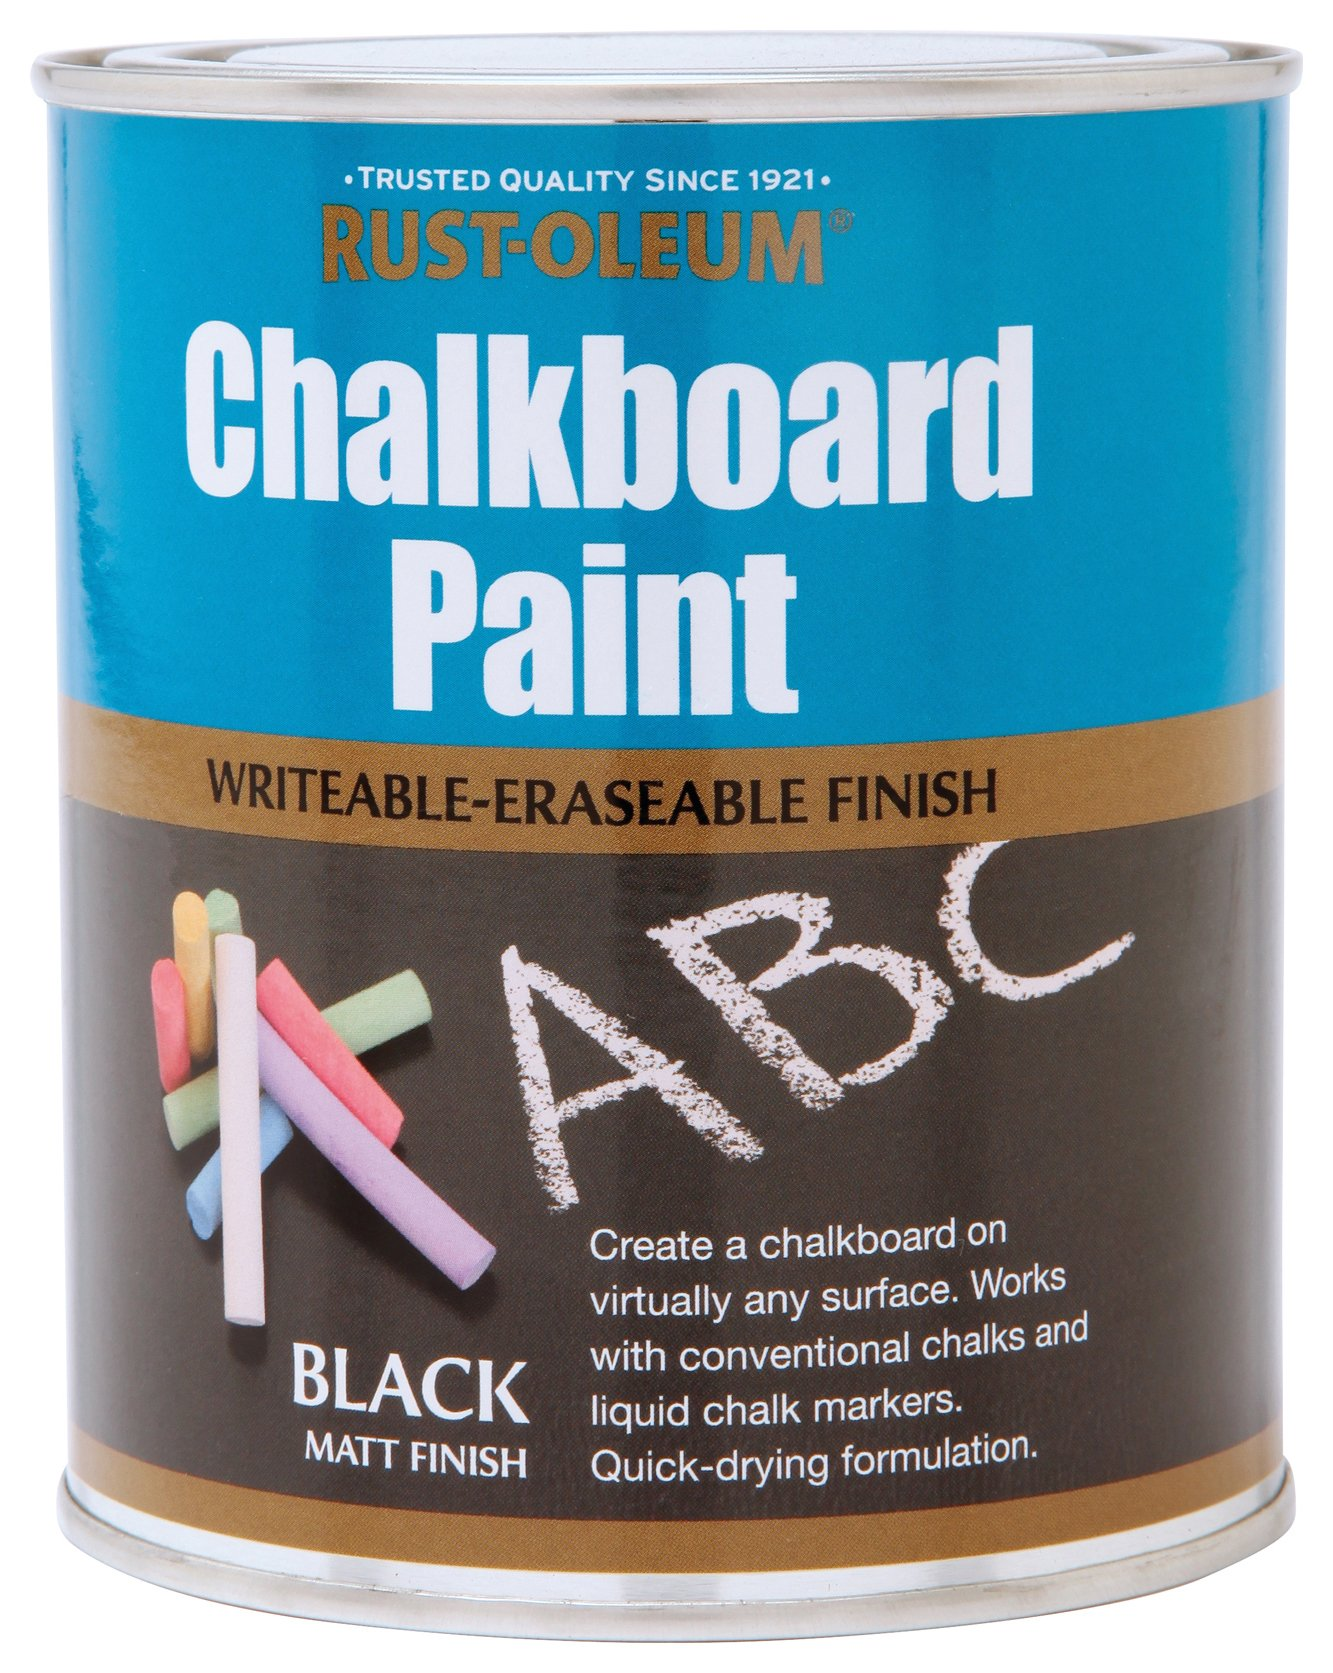 Rust-Oleum Chalkboard Paint 750ml - Matt Black